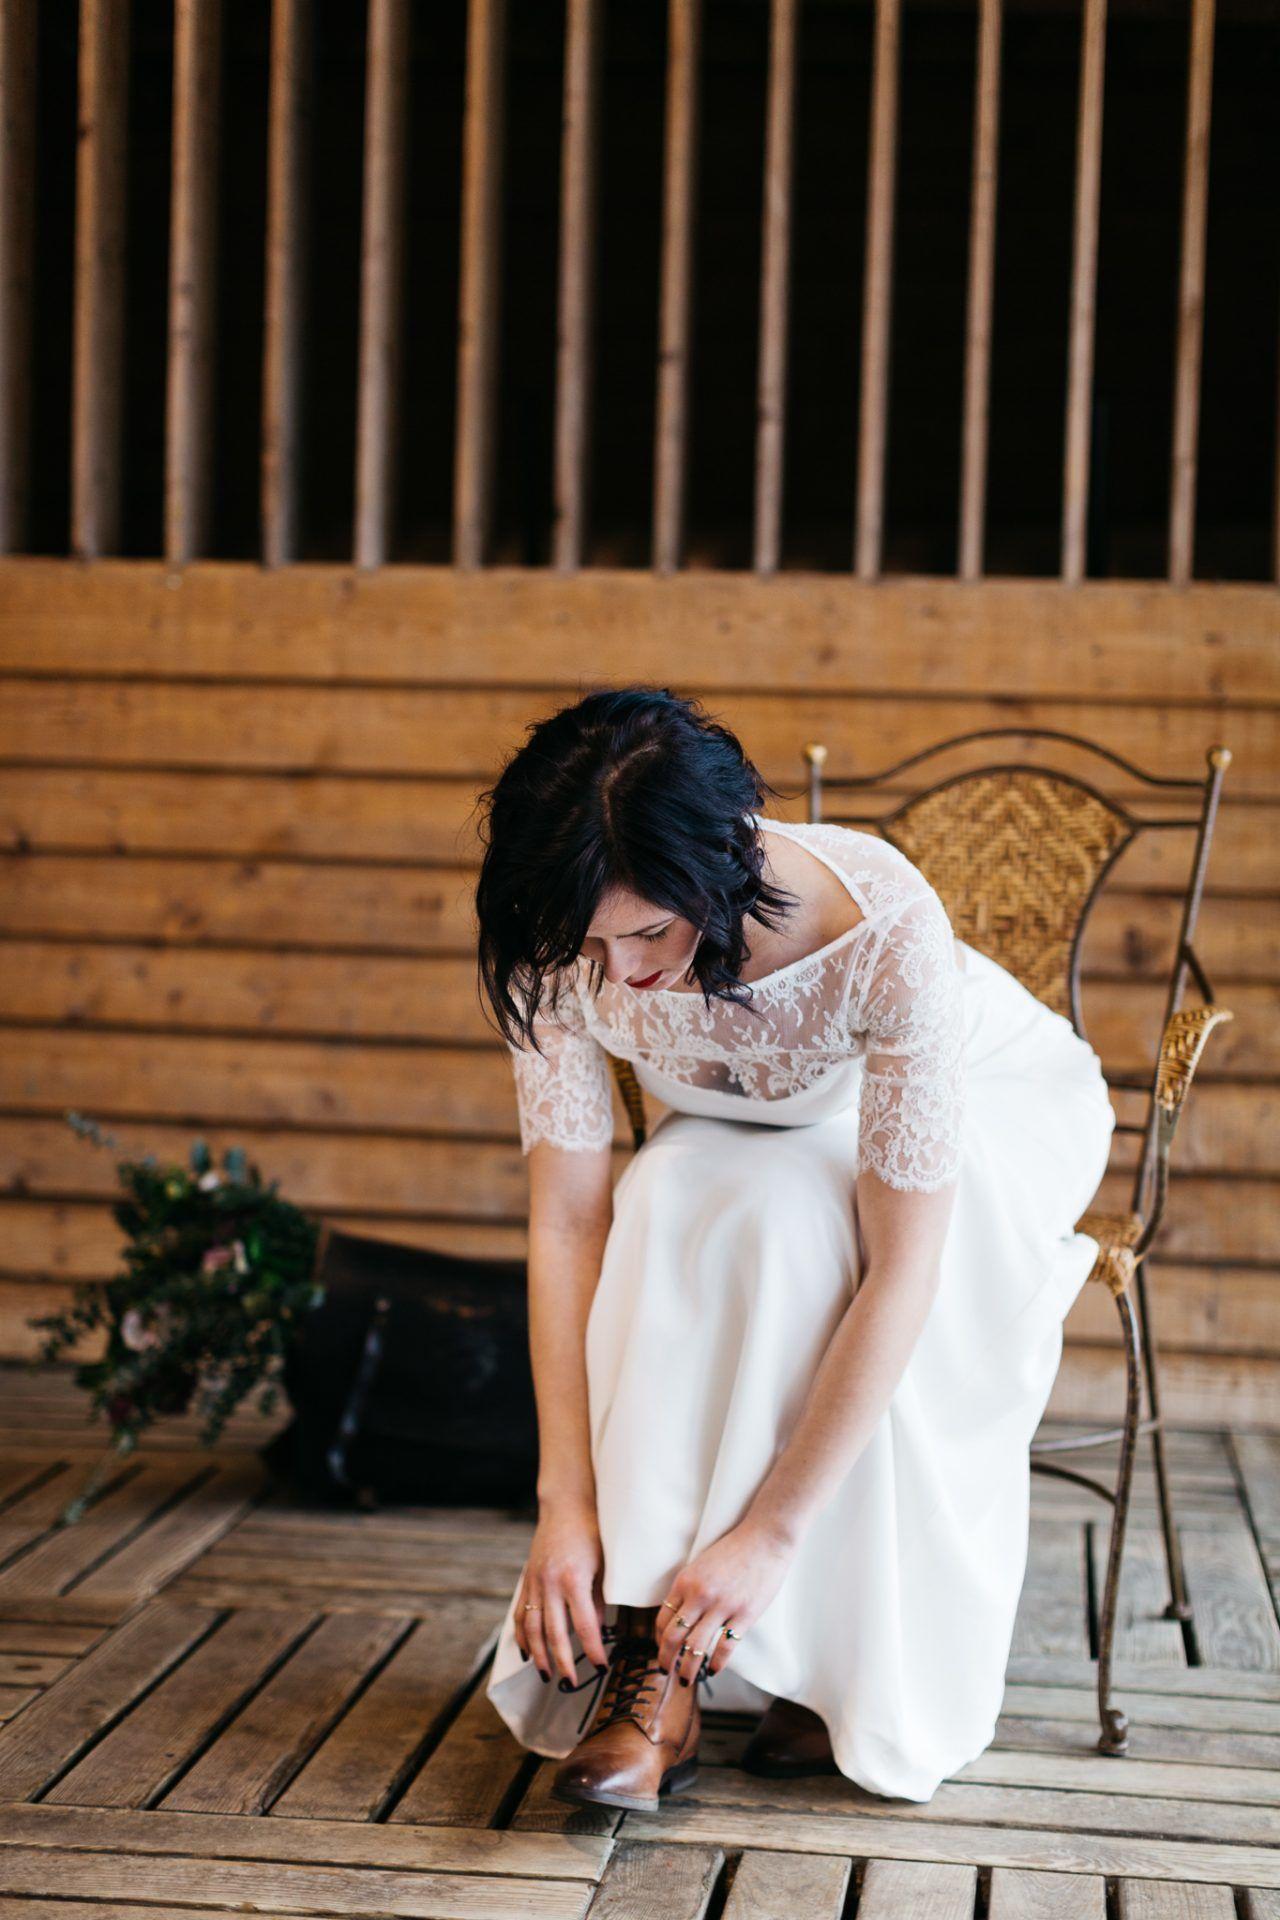 mariage chalet en bois scandinave